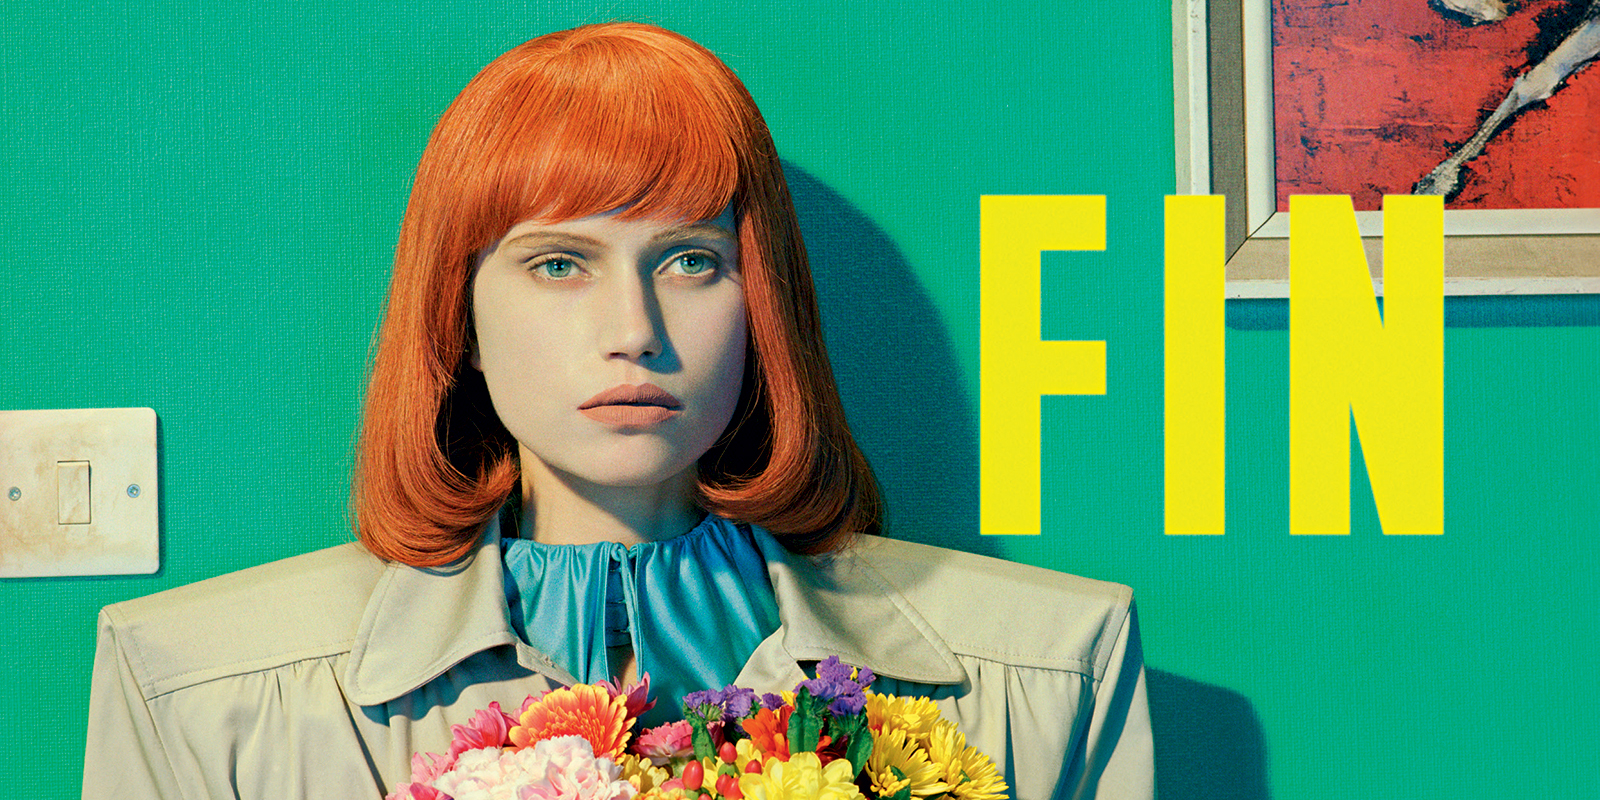 imgchili.com @@@ 2 Cato Van Ee | Vogue Italia Beauty